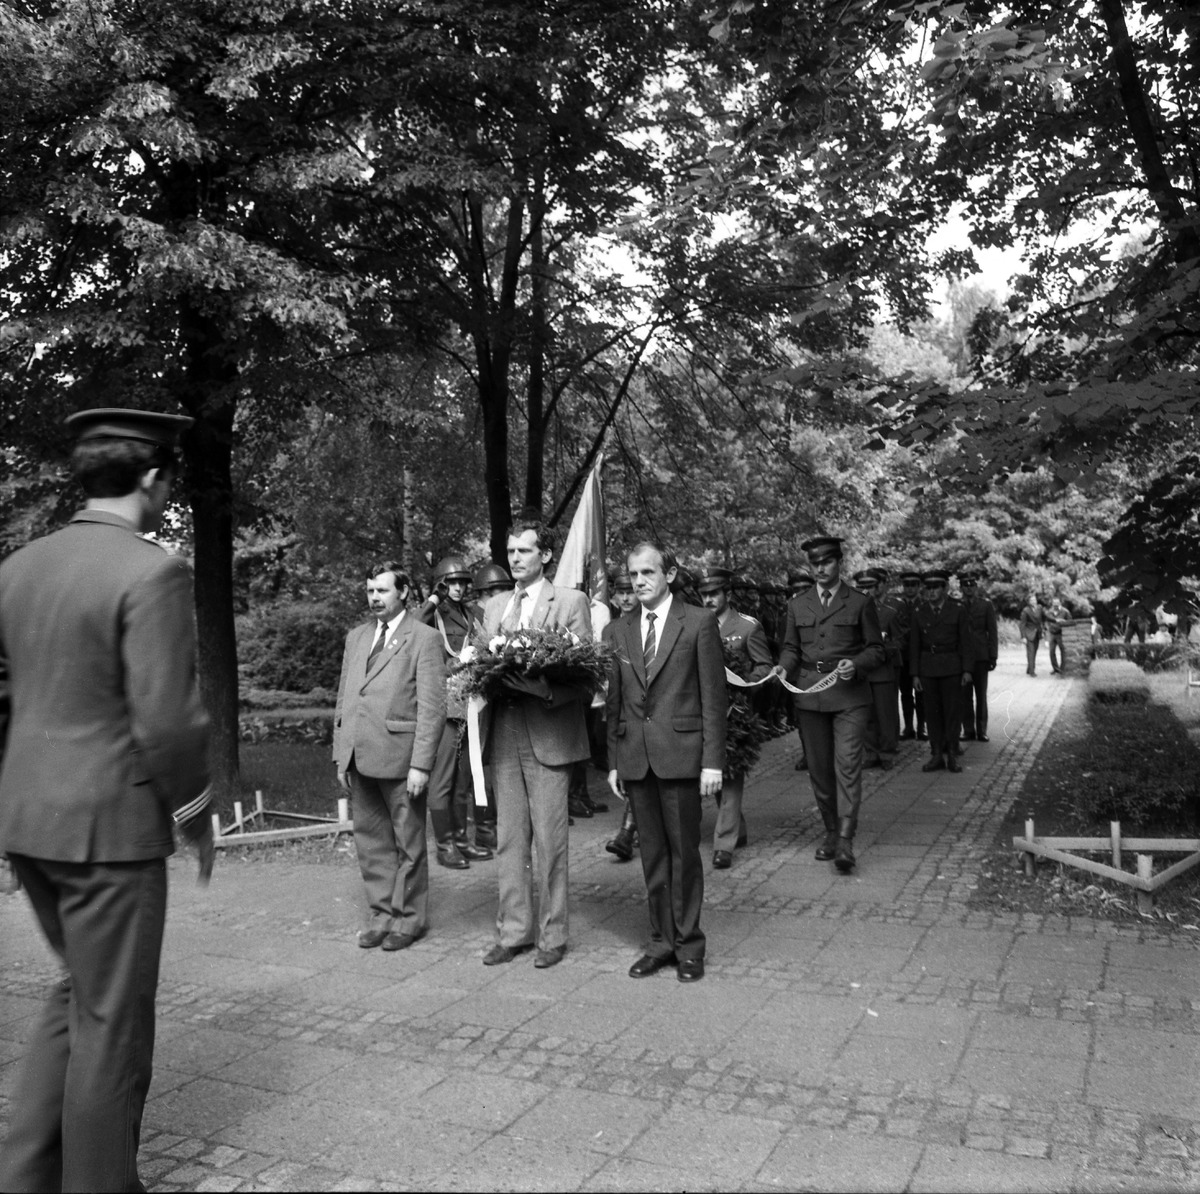 Wizyta delegacji ZSRR, 1984 r.